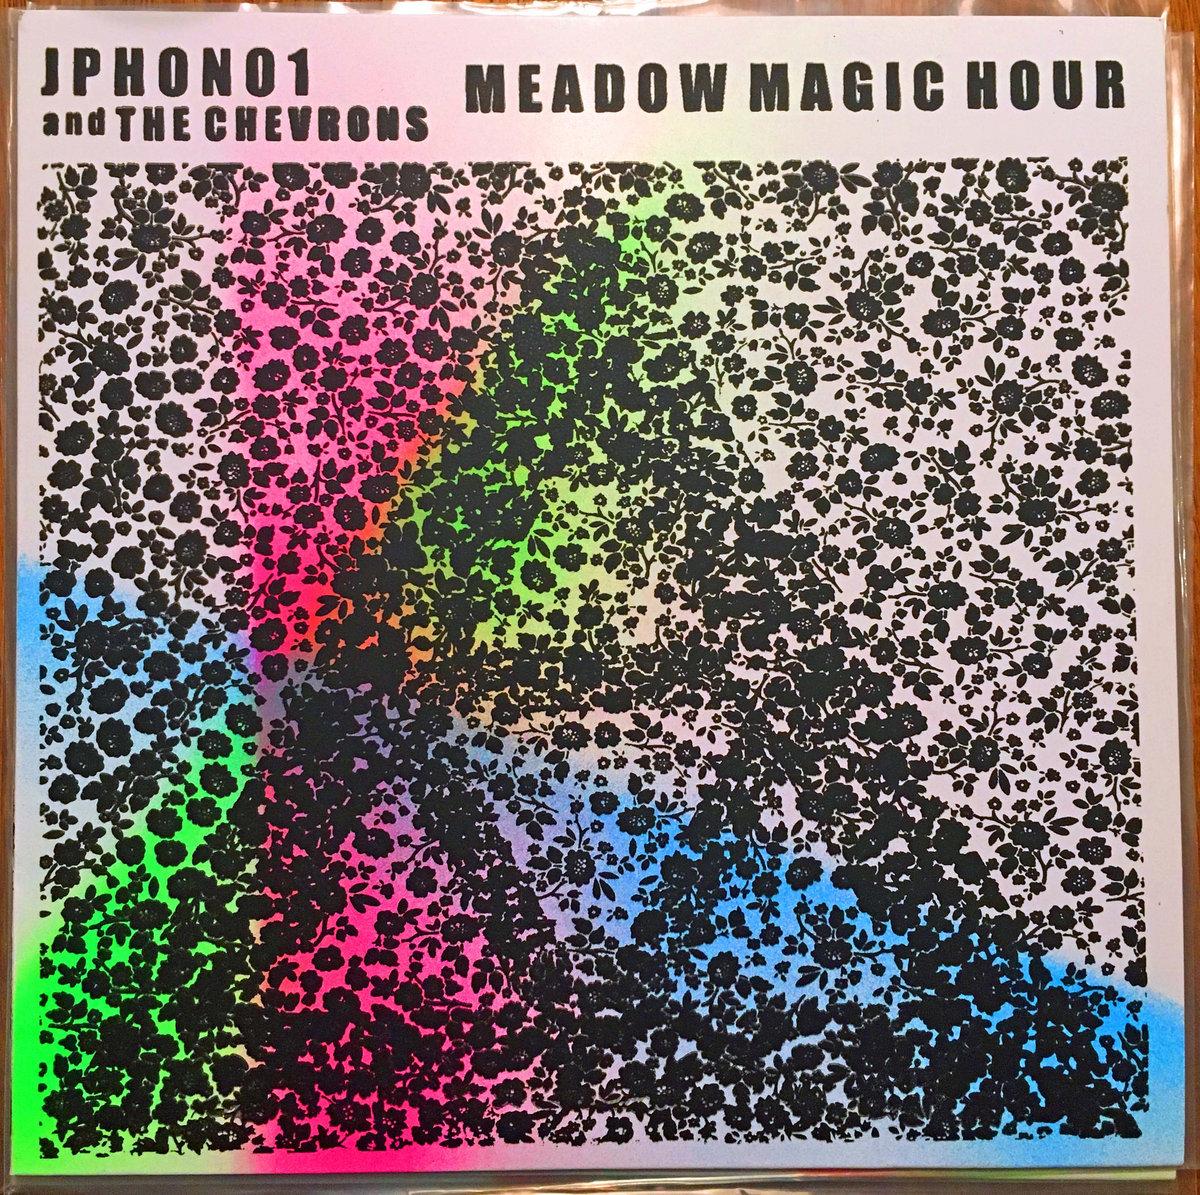 Meadow Magic Hour | jphono1